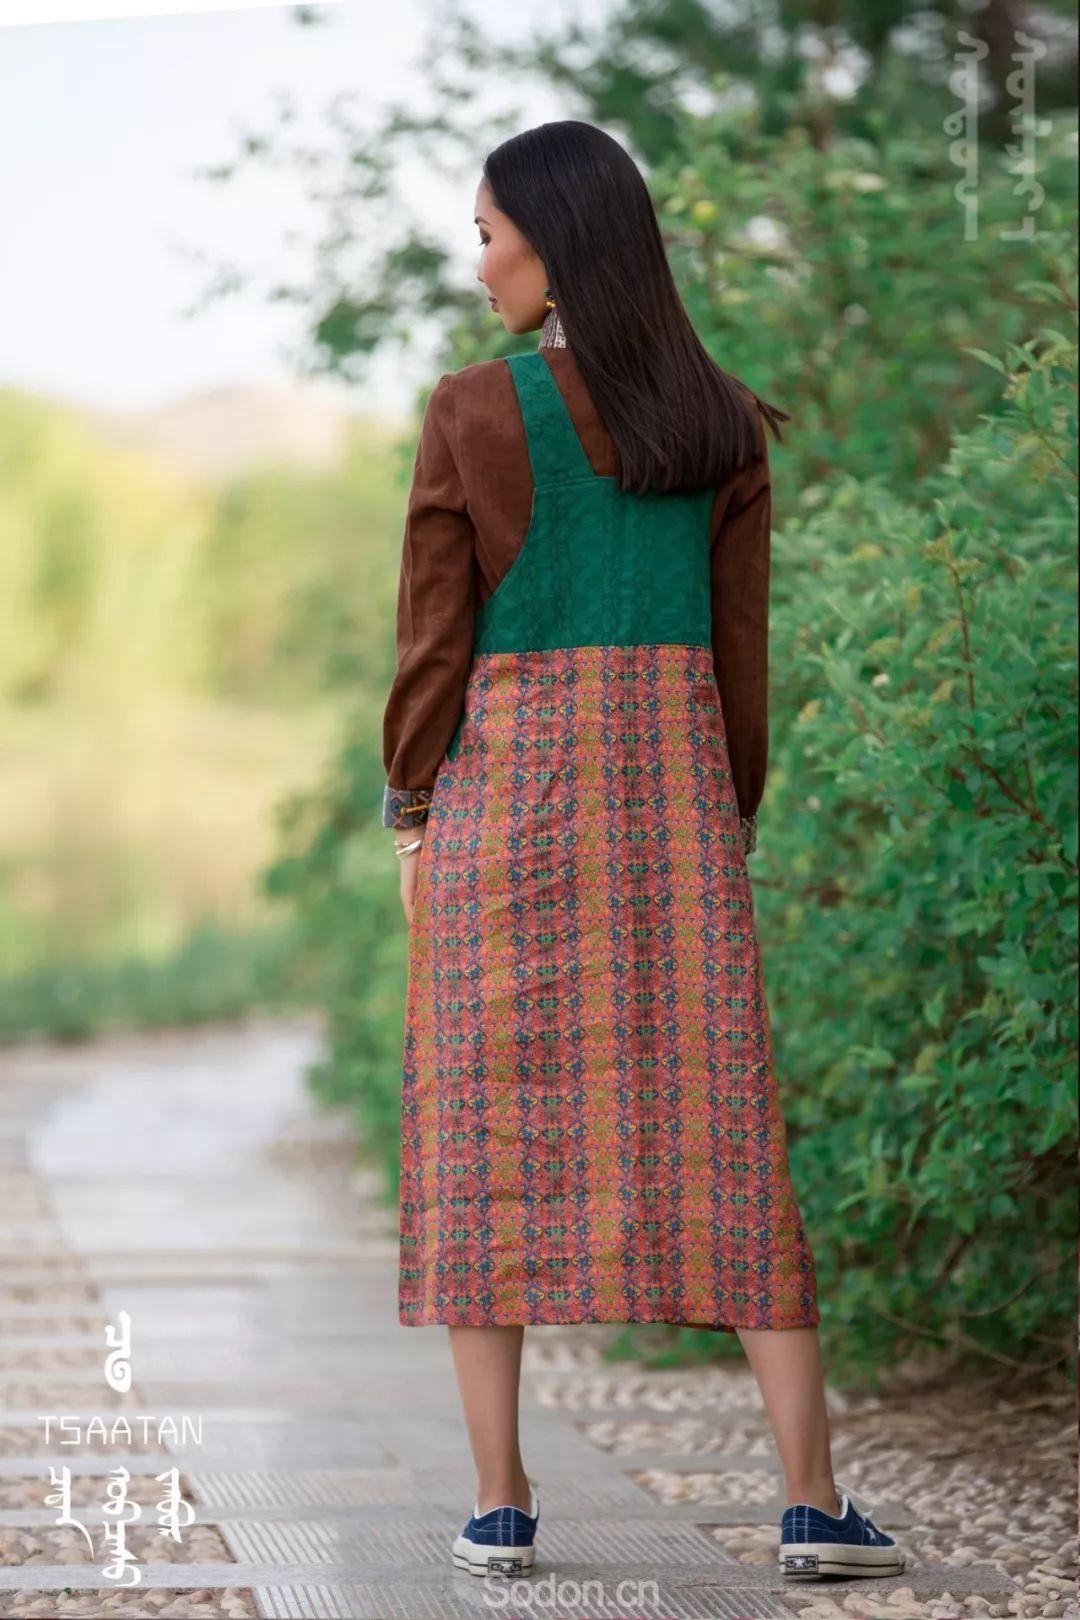 TSAATAN蒙古时装 2019夏季新款首发 第83张